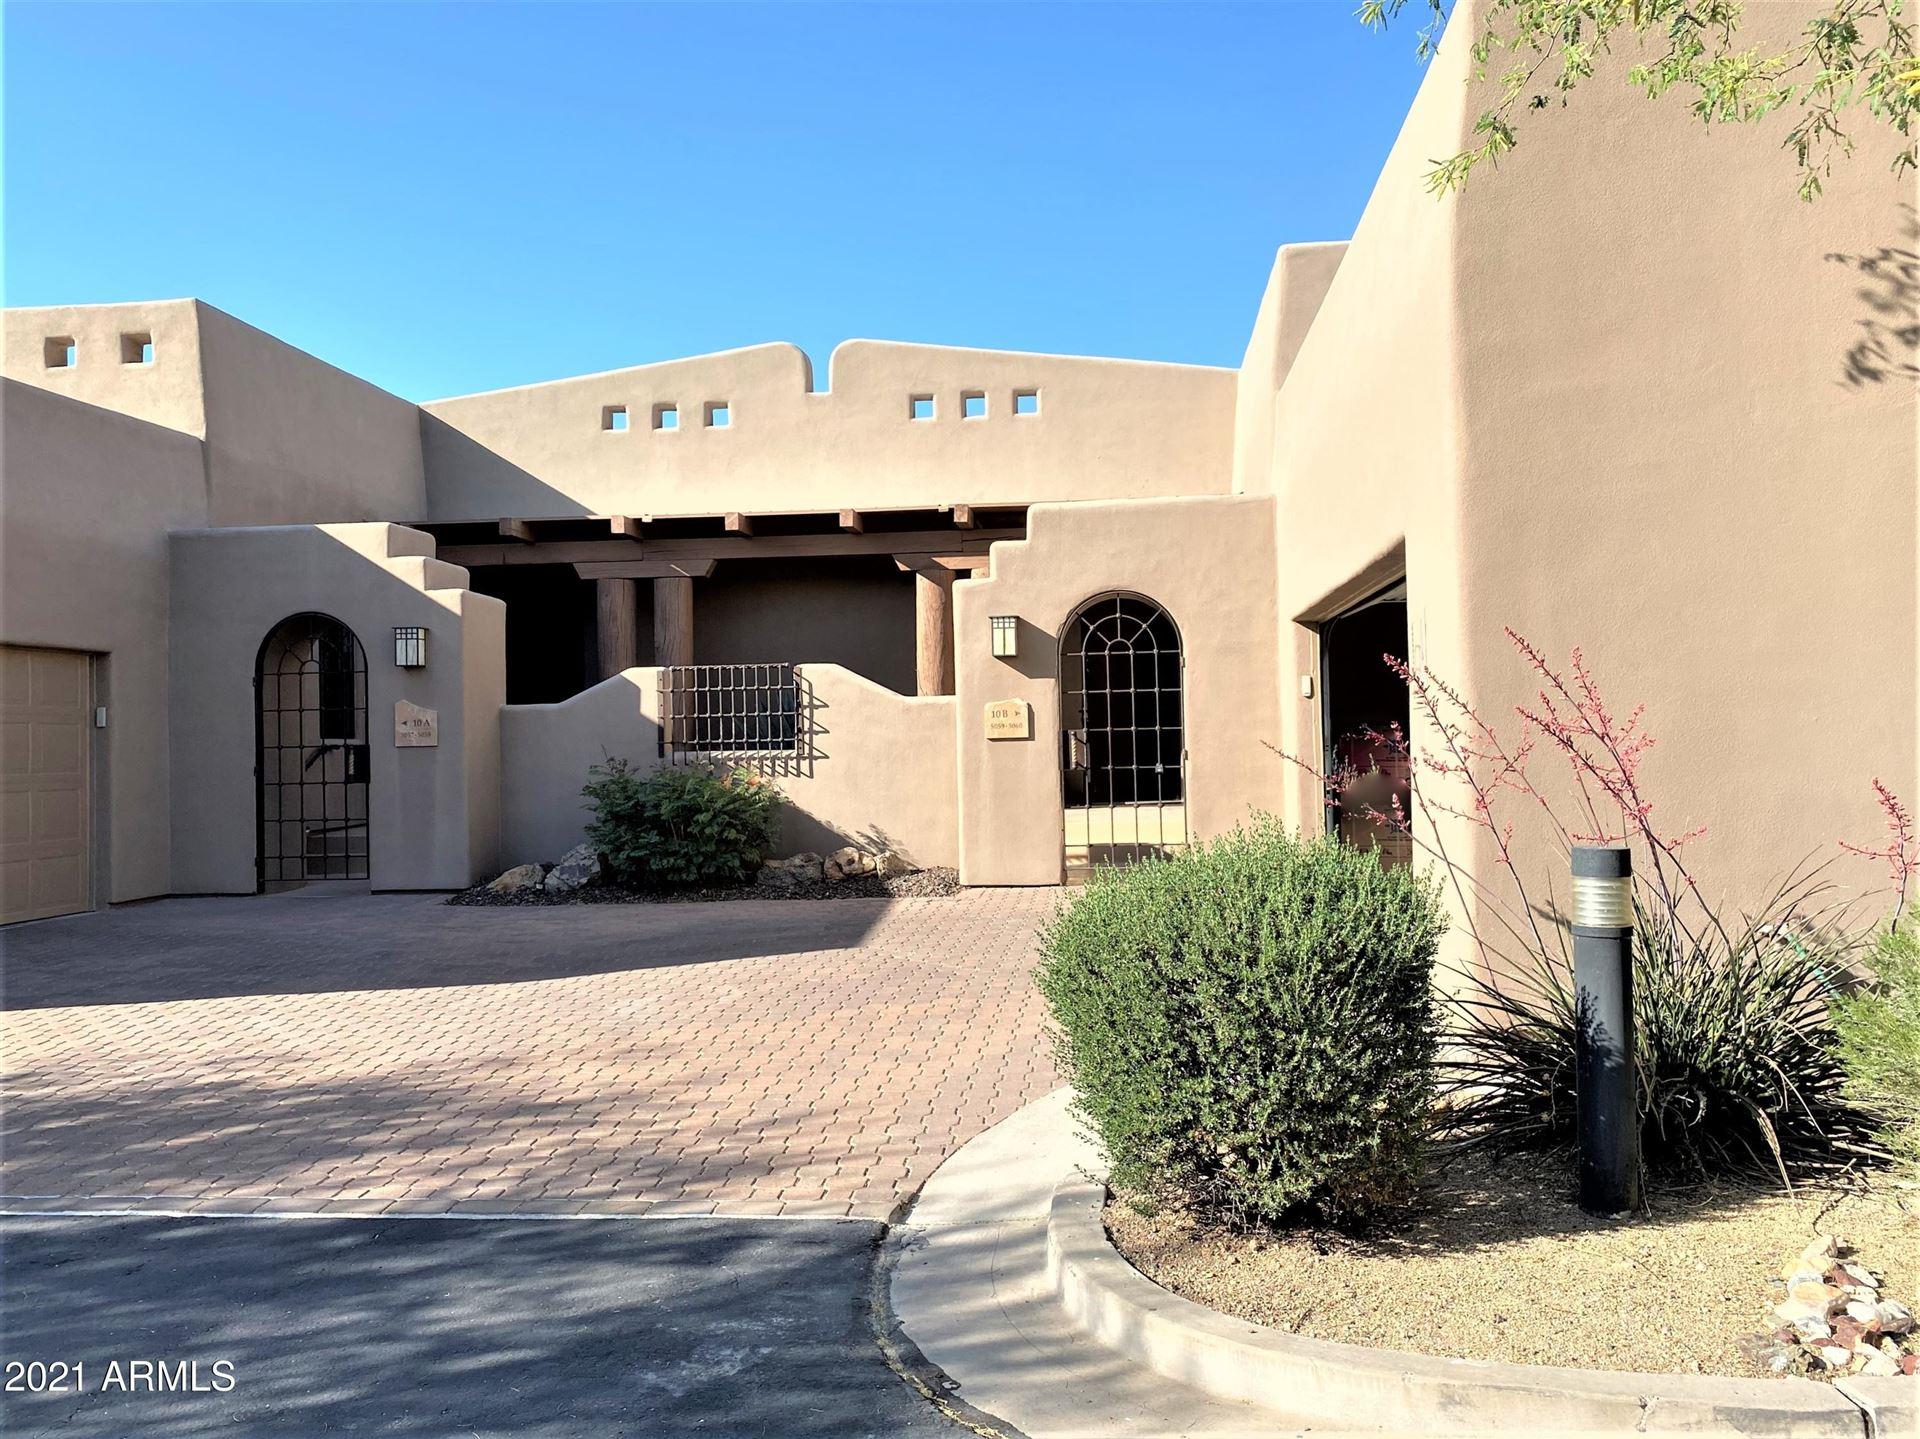 Photo of 36601 N MULE TRAIN Road #B10, Carefree, AZ 85377 (MLS # 6225075)